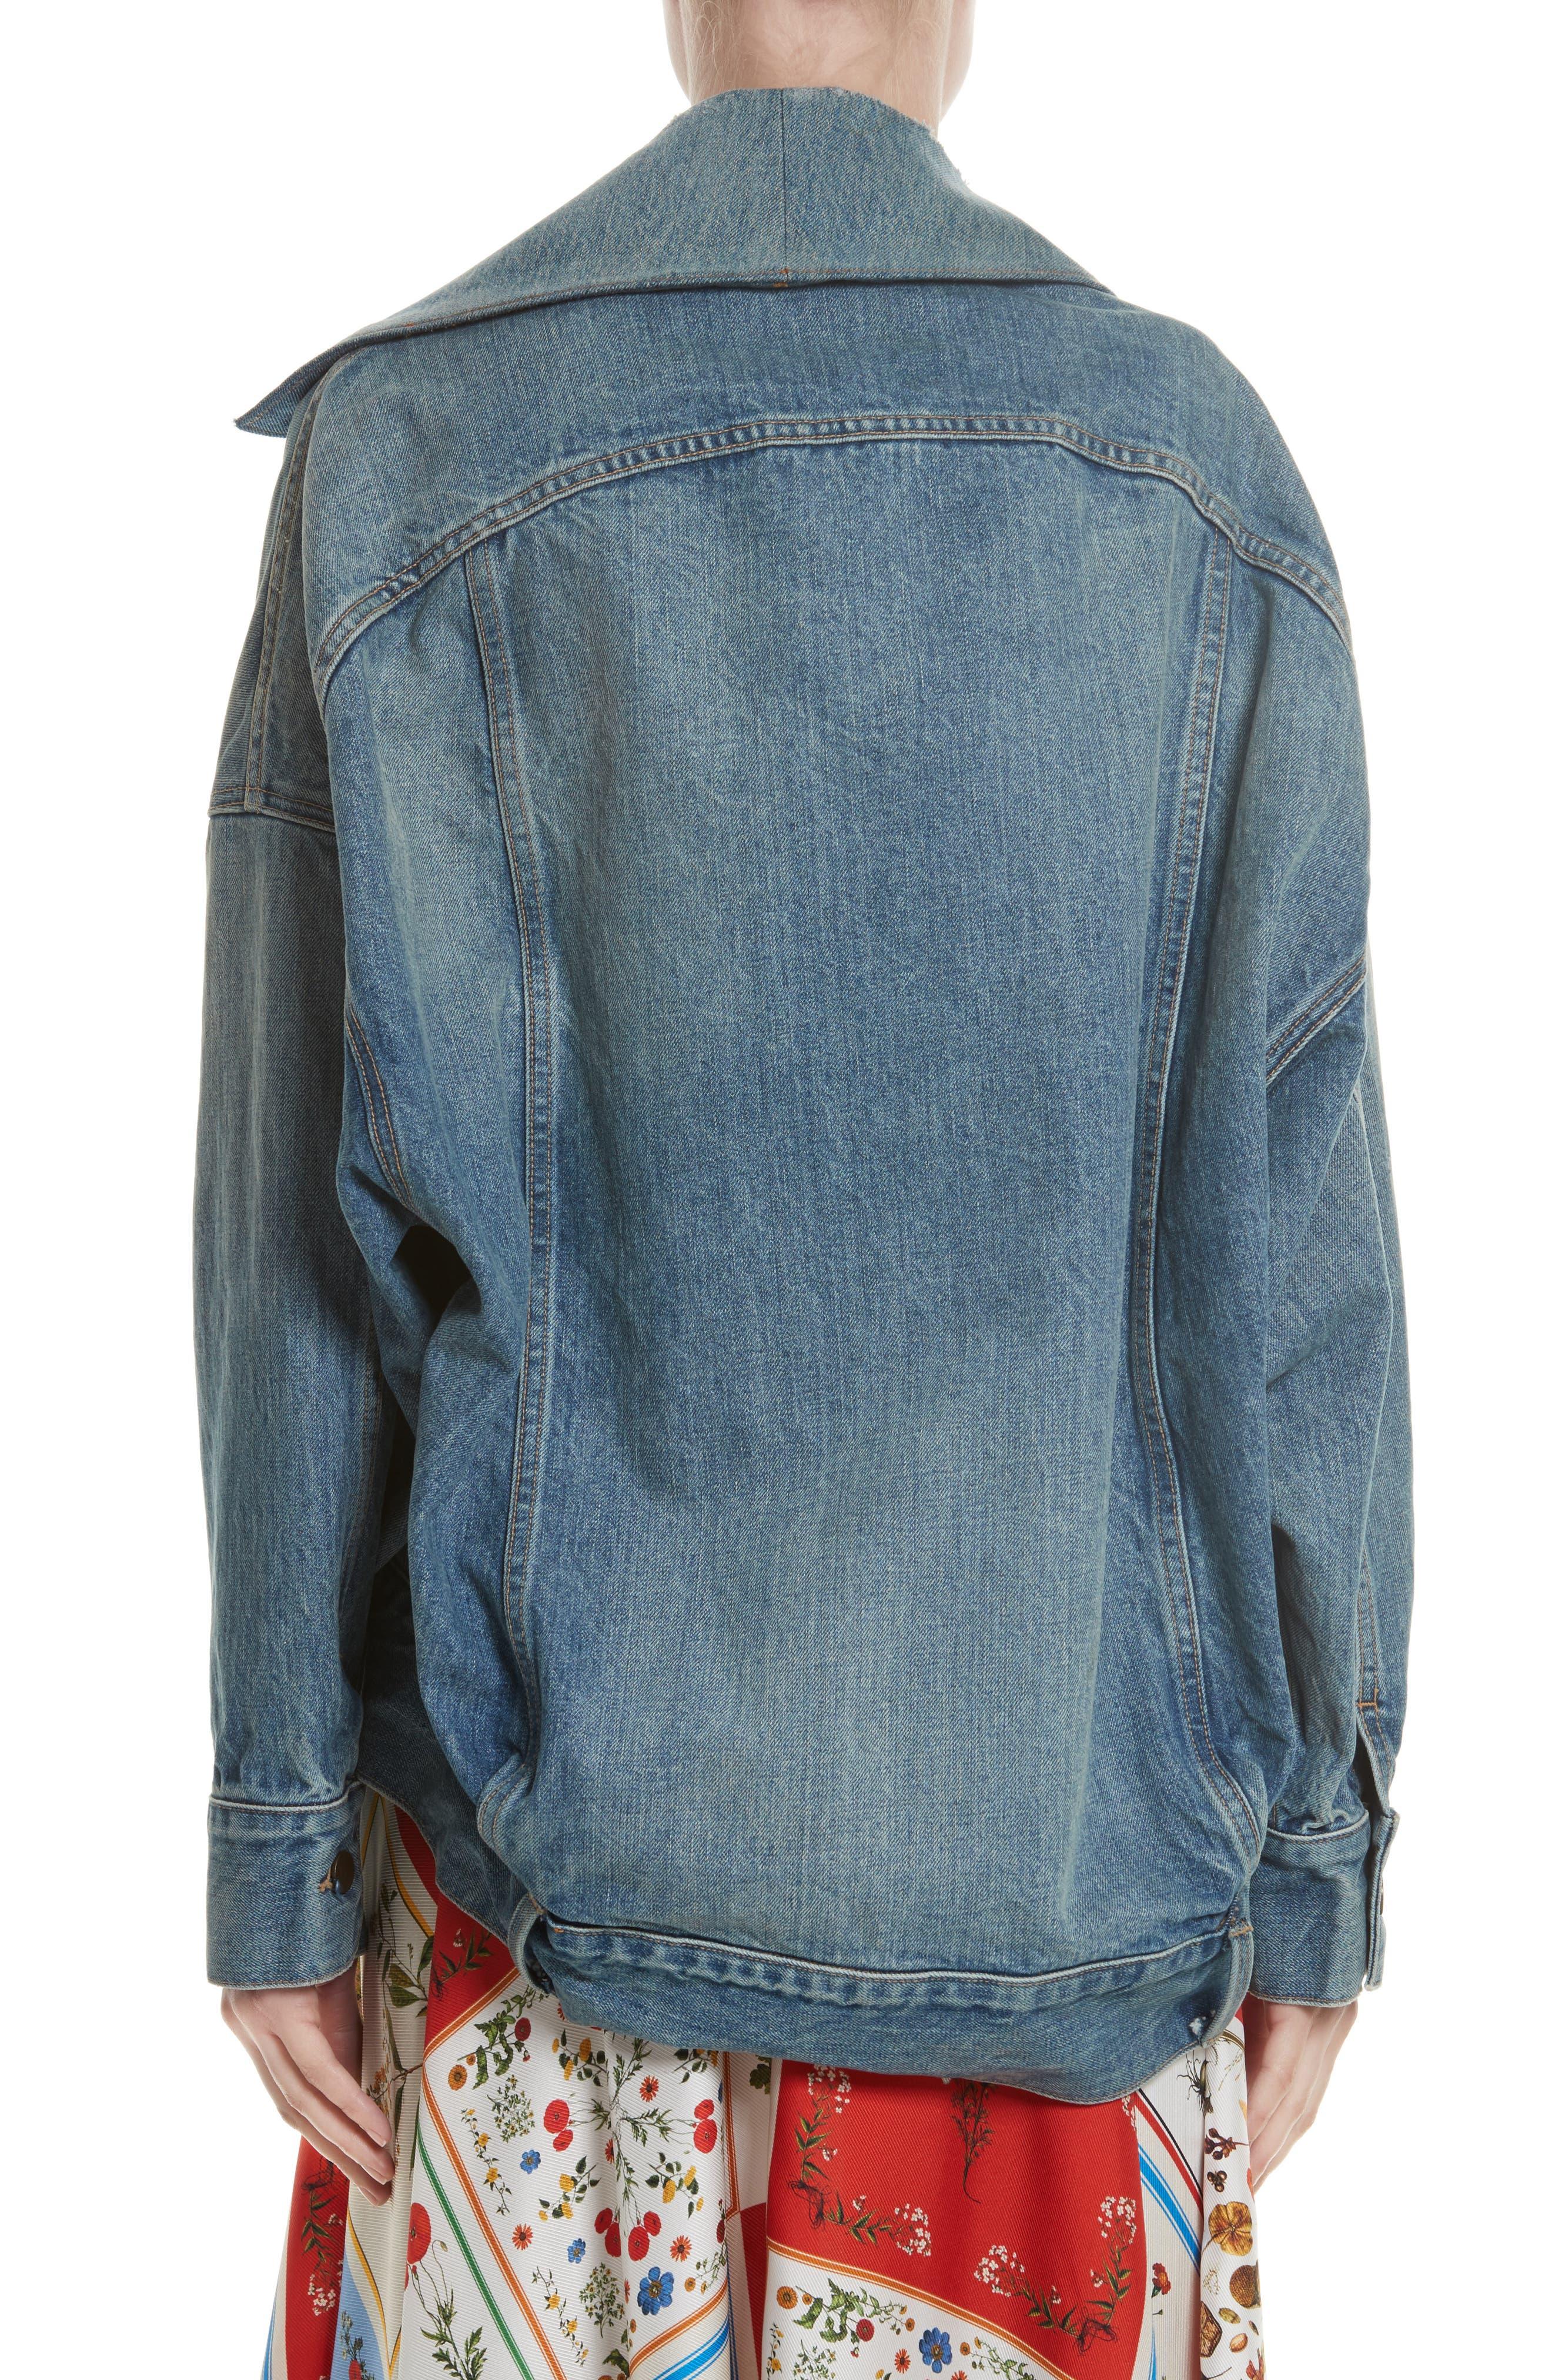 Cocoon Denim Jacket,                             Alternate thumbnail 3, color,                             Blue